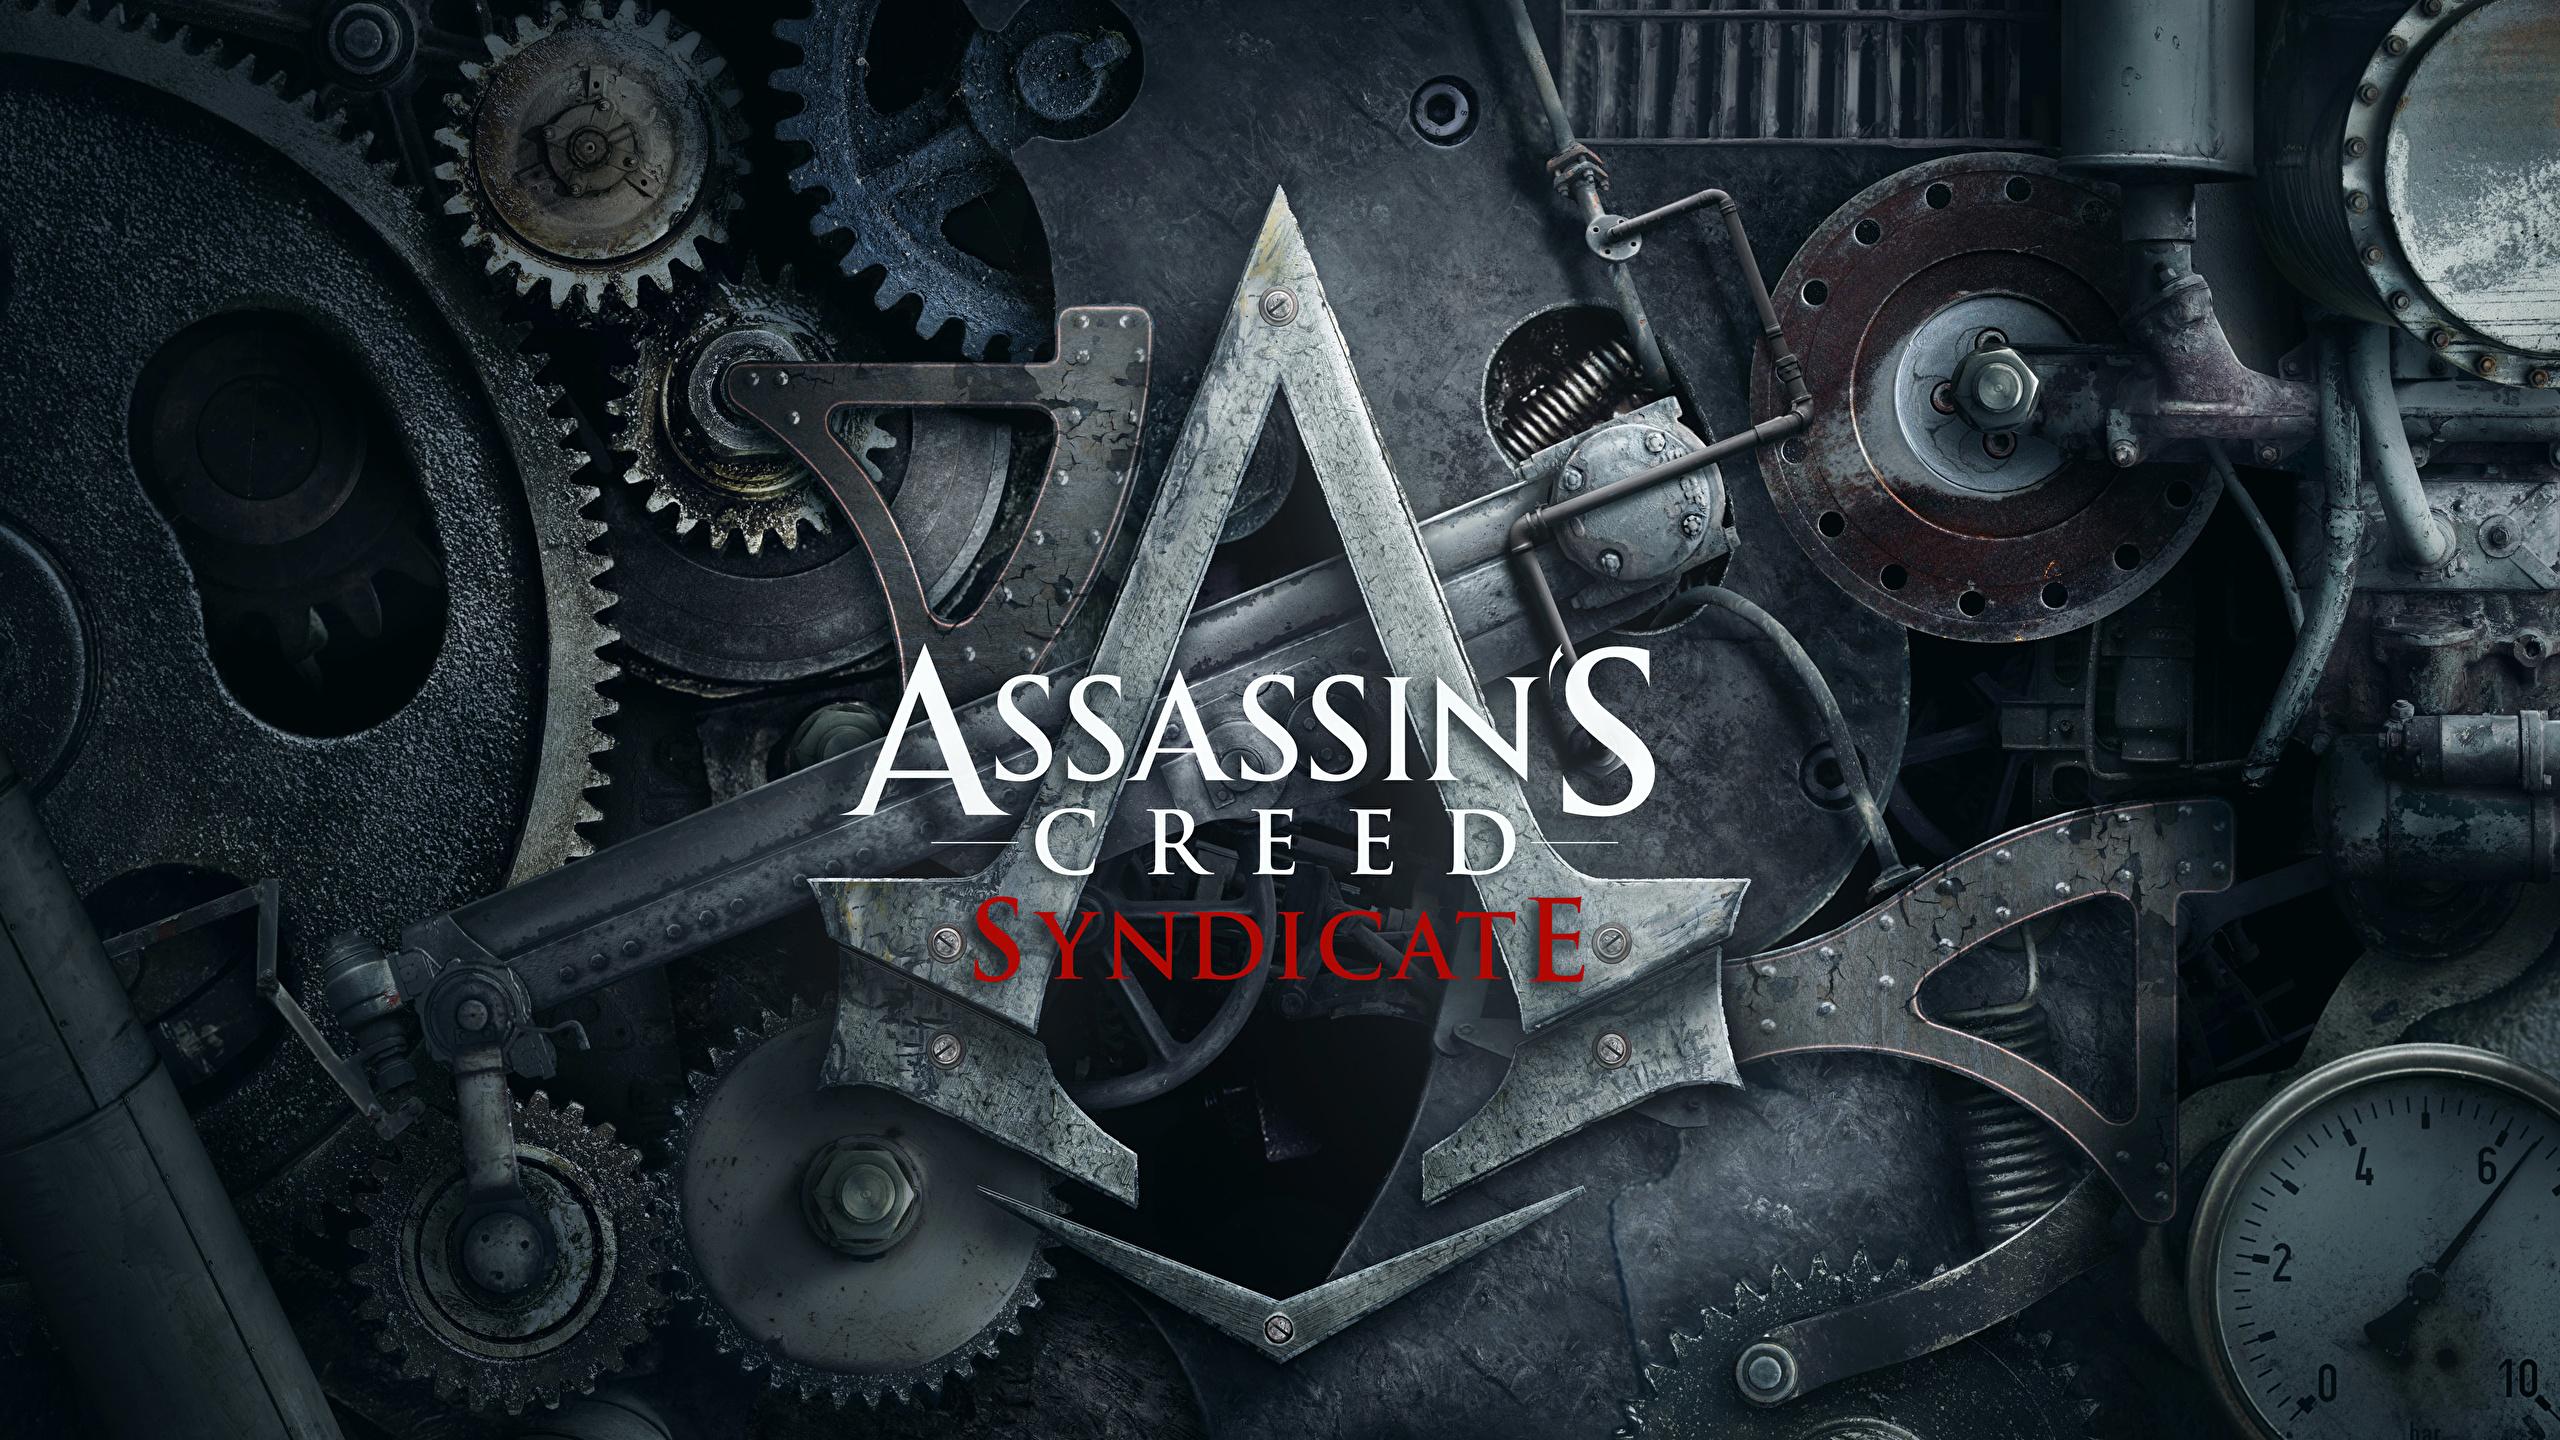 Desktop Wallpapers Assassin\'s Creed Assassin\'s Creed 2560x1440.